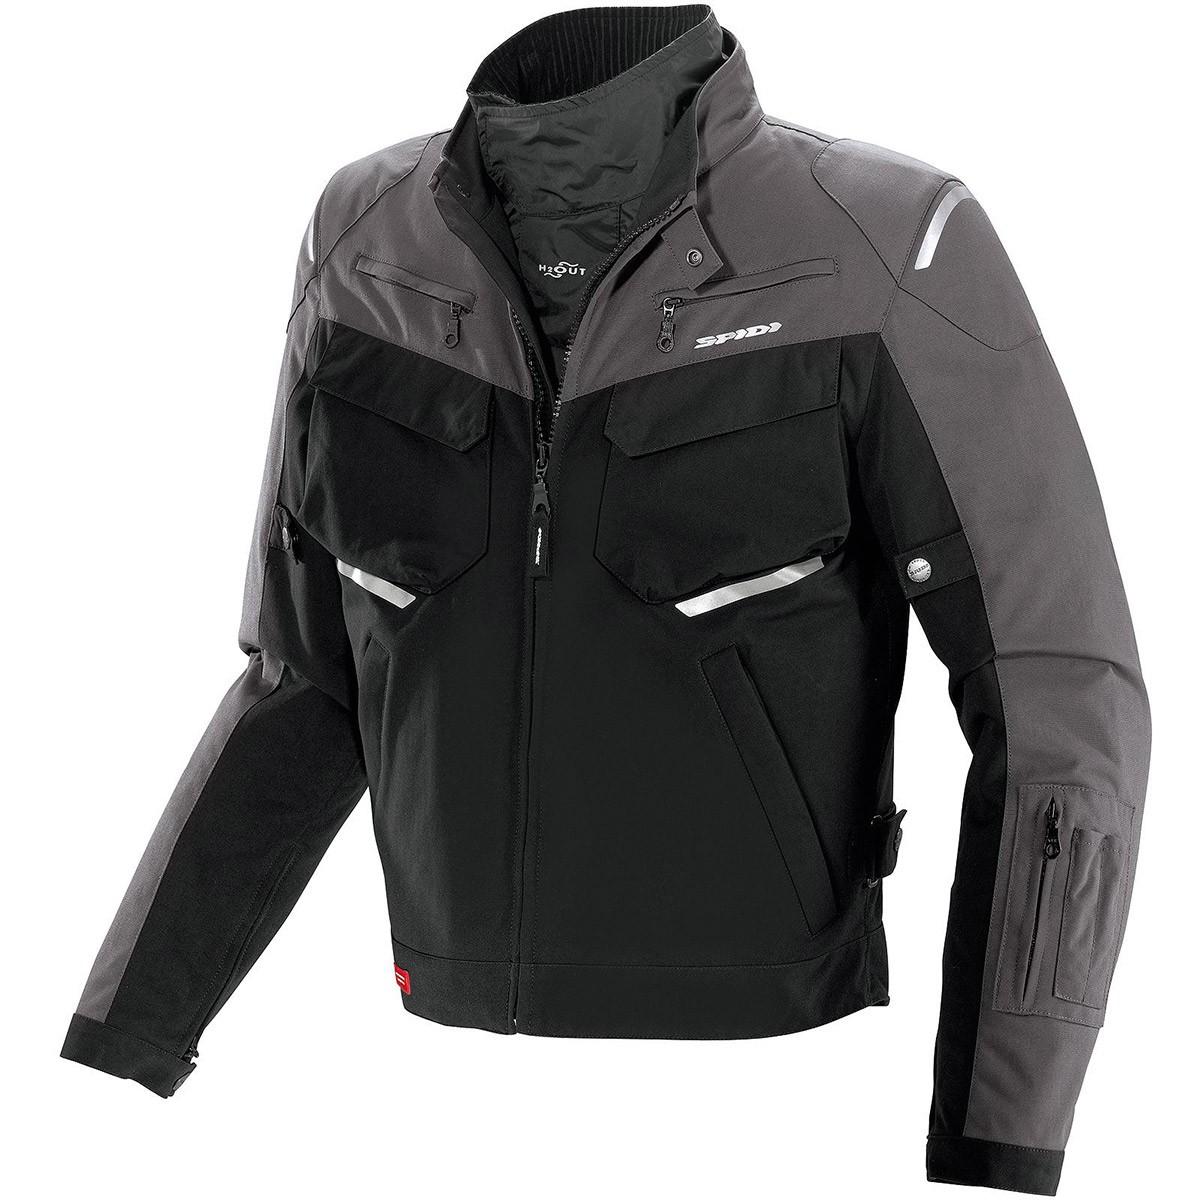 Jaqueta Spidi Adventurer H2OUT  Pta/Cinza - SUPEROFERTA!  - Nova Centro Boutique Roupas para Motociclistas